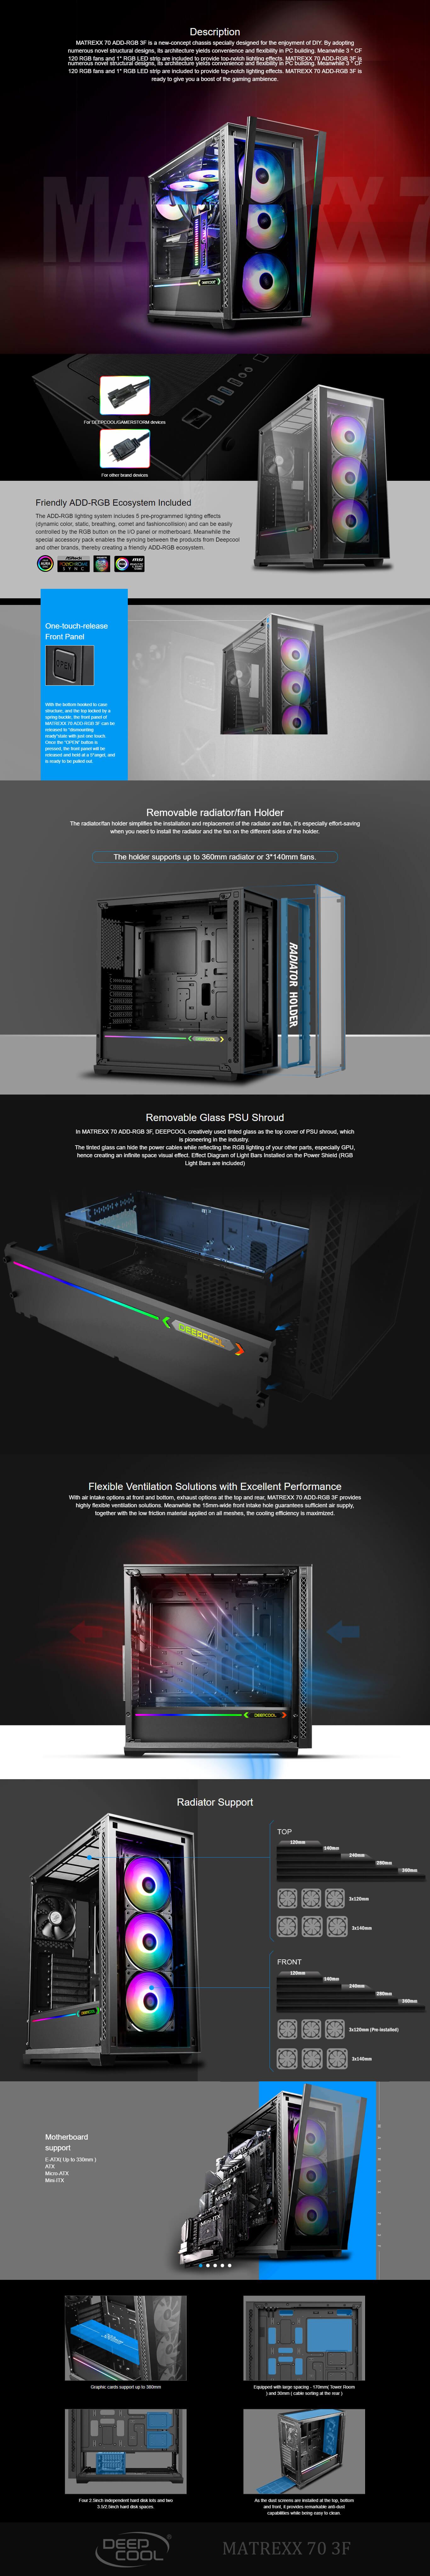 Deepcool Matrexx 70 Addressable RGB (Black) 8